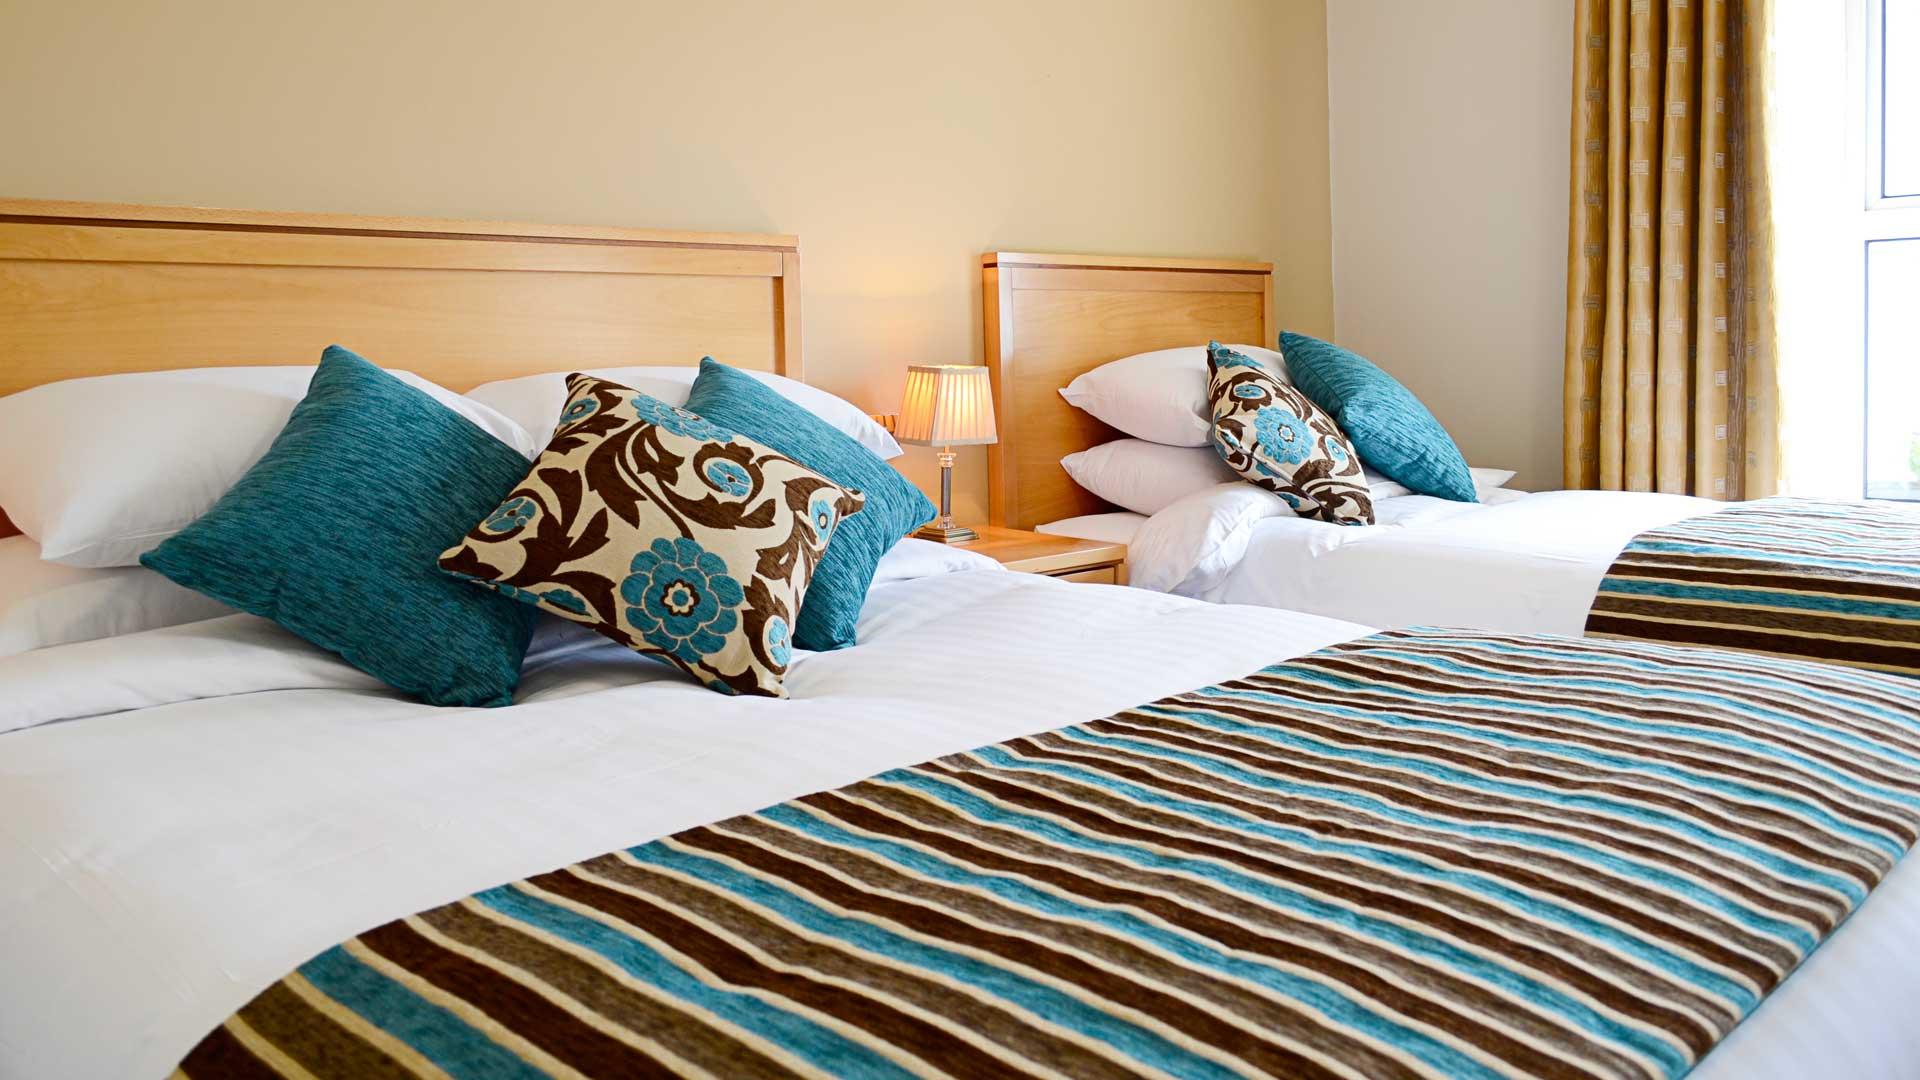 cill-aodain-hotel-kiltimagh-accommodation-05